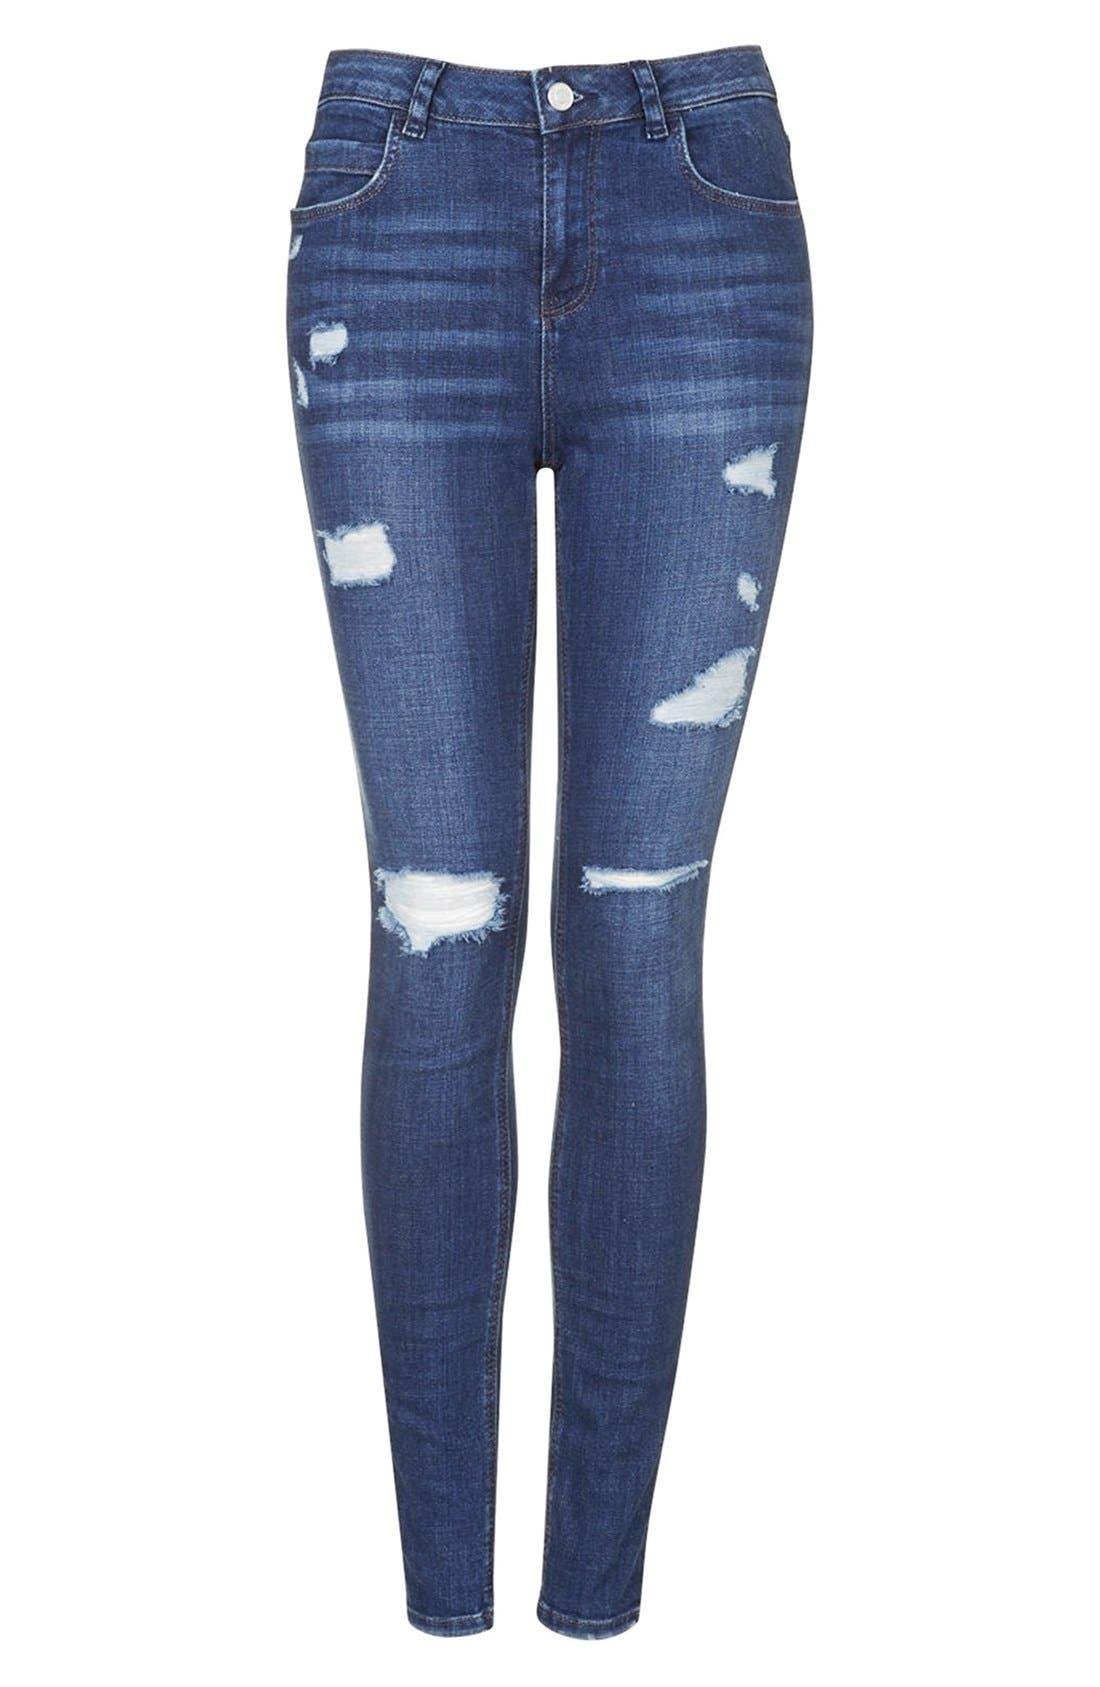 Moto Ripped Skinny Jeans,                             Alternate thumbnail 3, color,                             Dark Denim